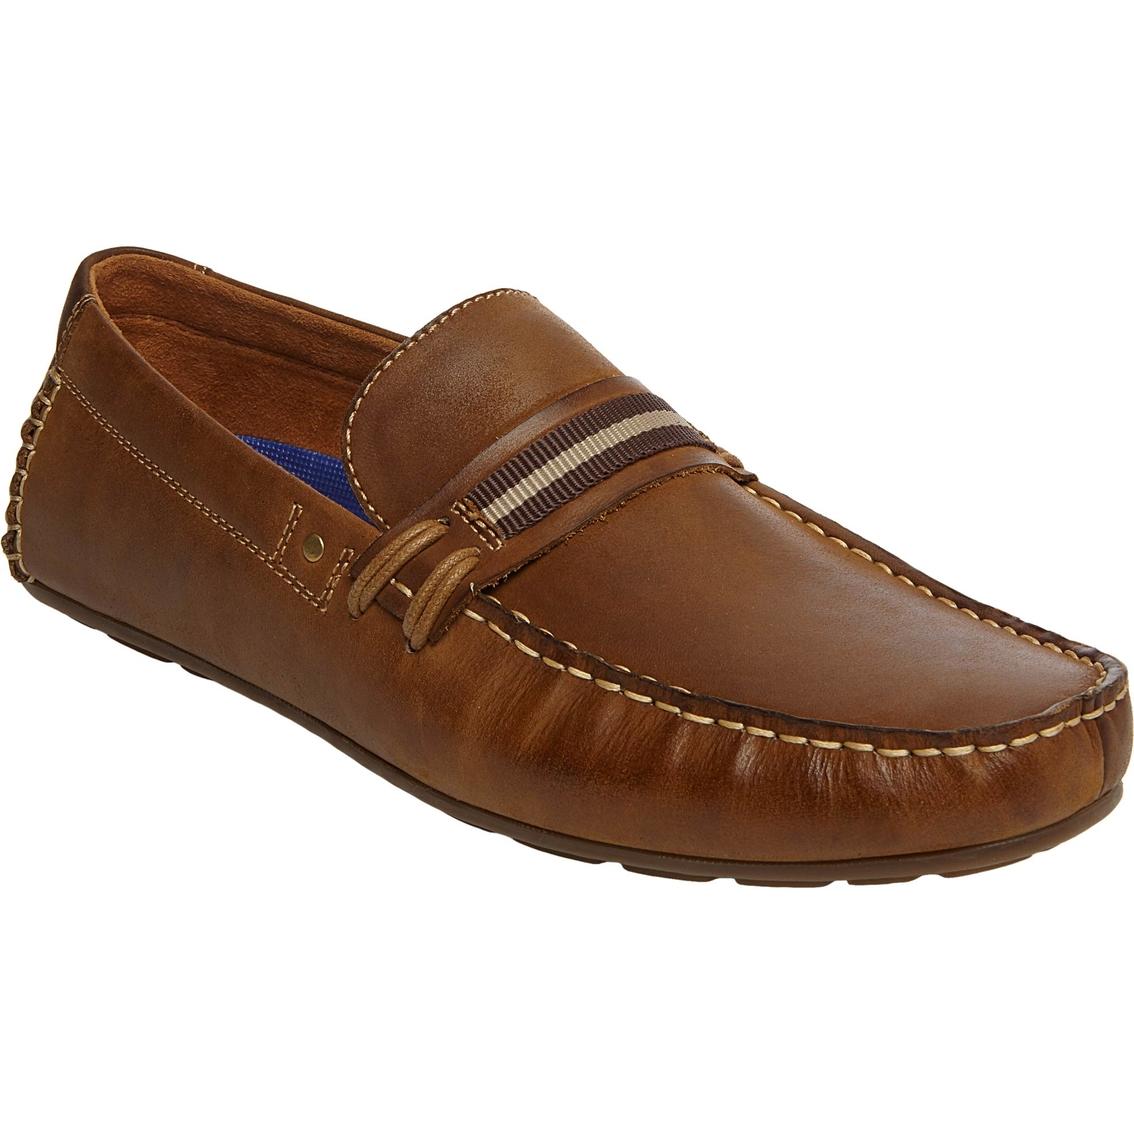 2b33623296a Steve Madden Gander Loafers